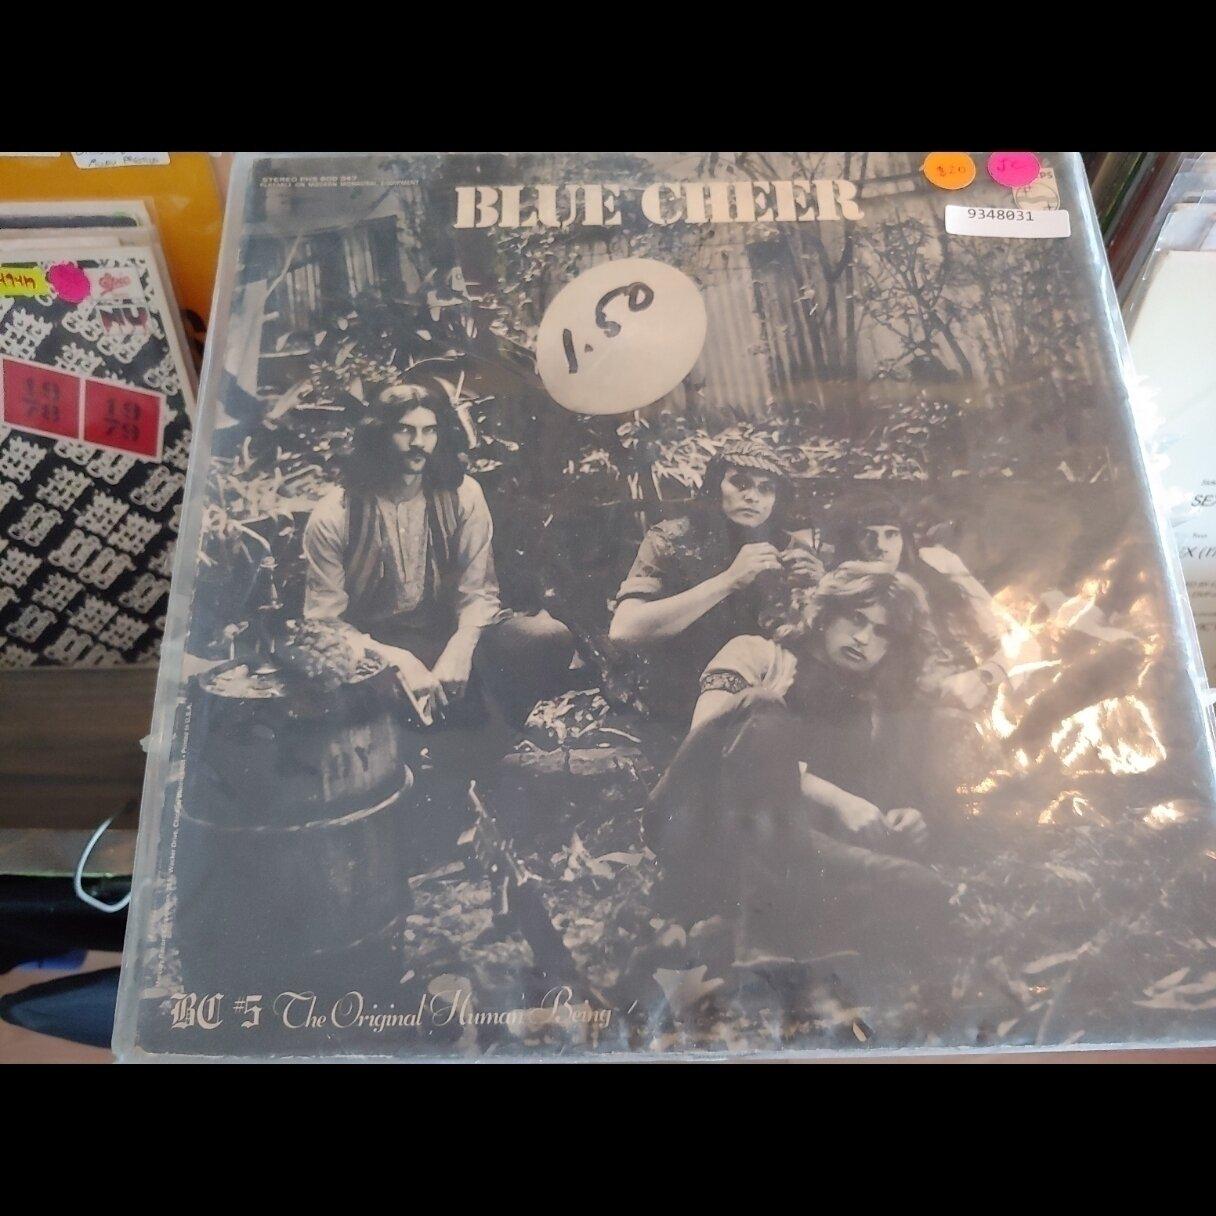 Blue Cheer - BC #5 The Original Human Being